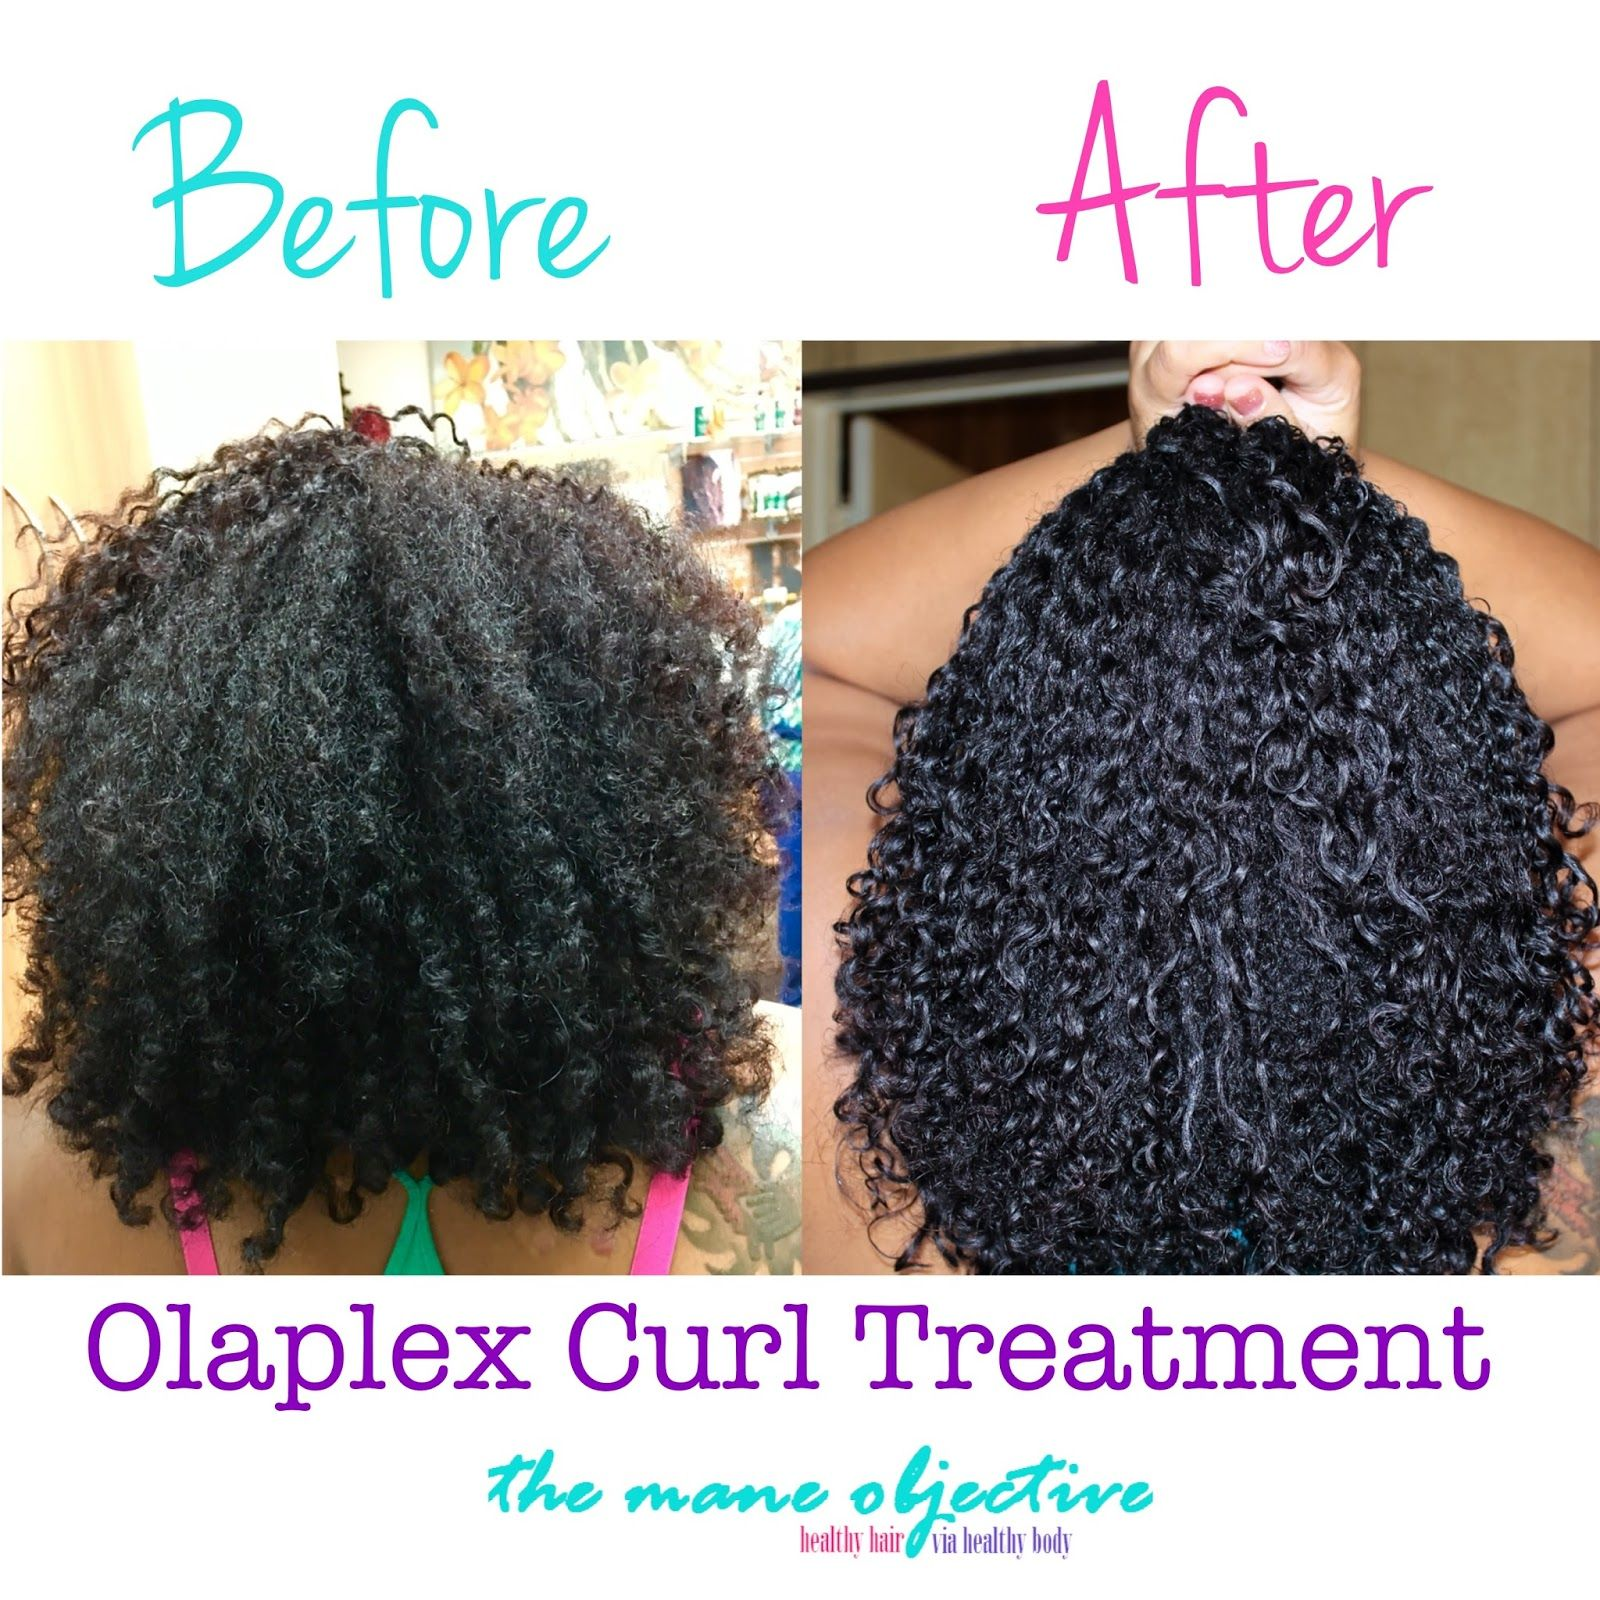 Does Olaplex Work on Natural Curly Hair? Curly hair